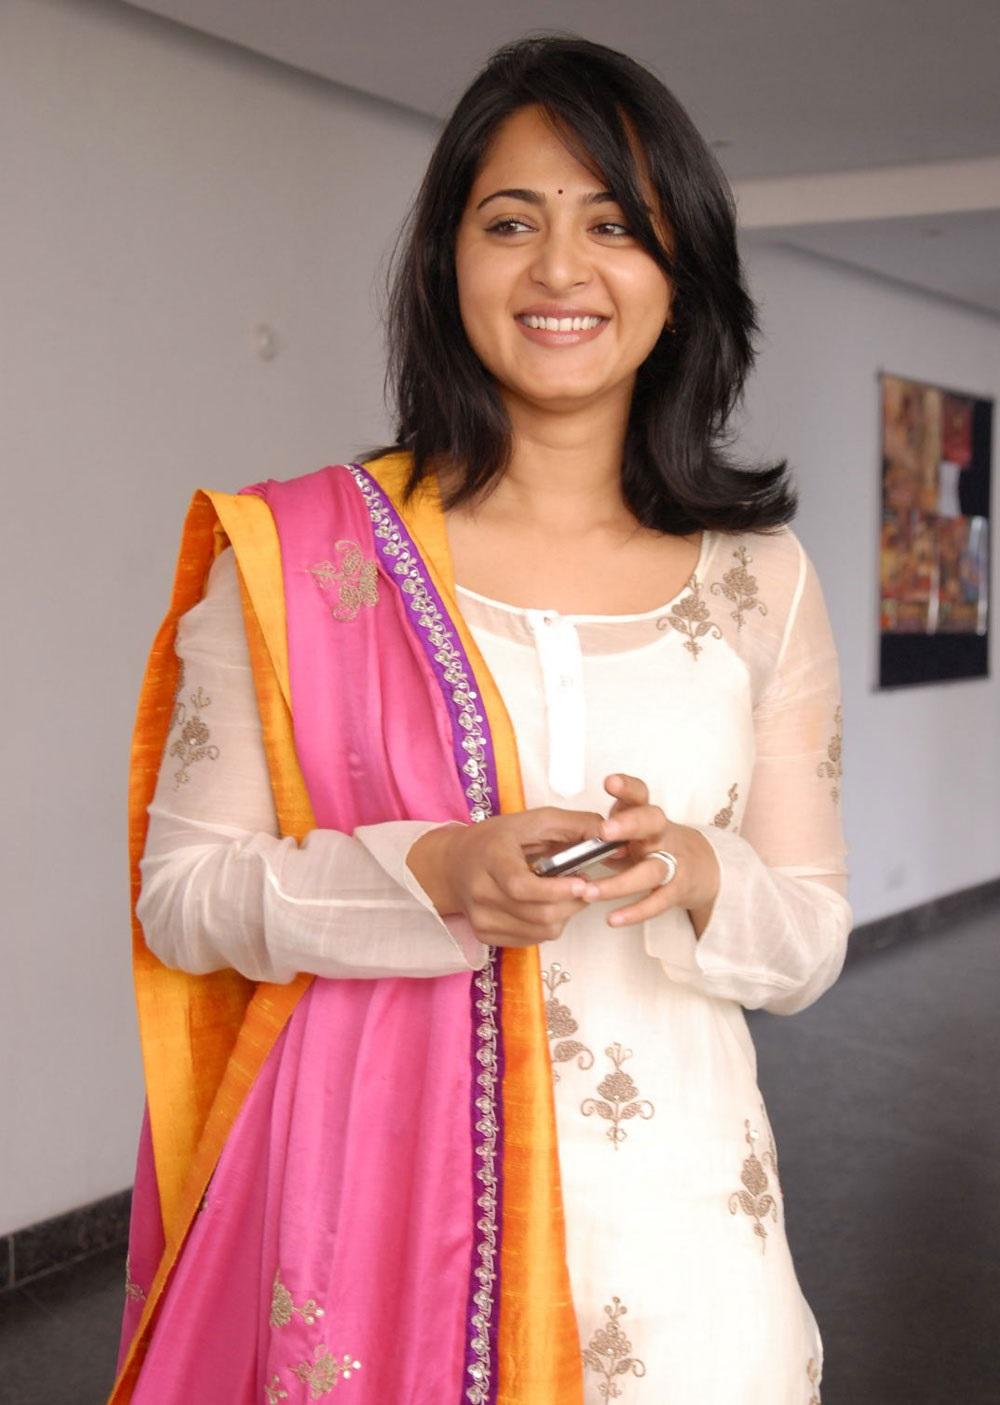 Tollywood Actress Anushka shetty Smiling Photos In Pink Churidar